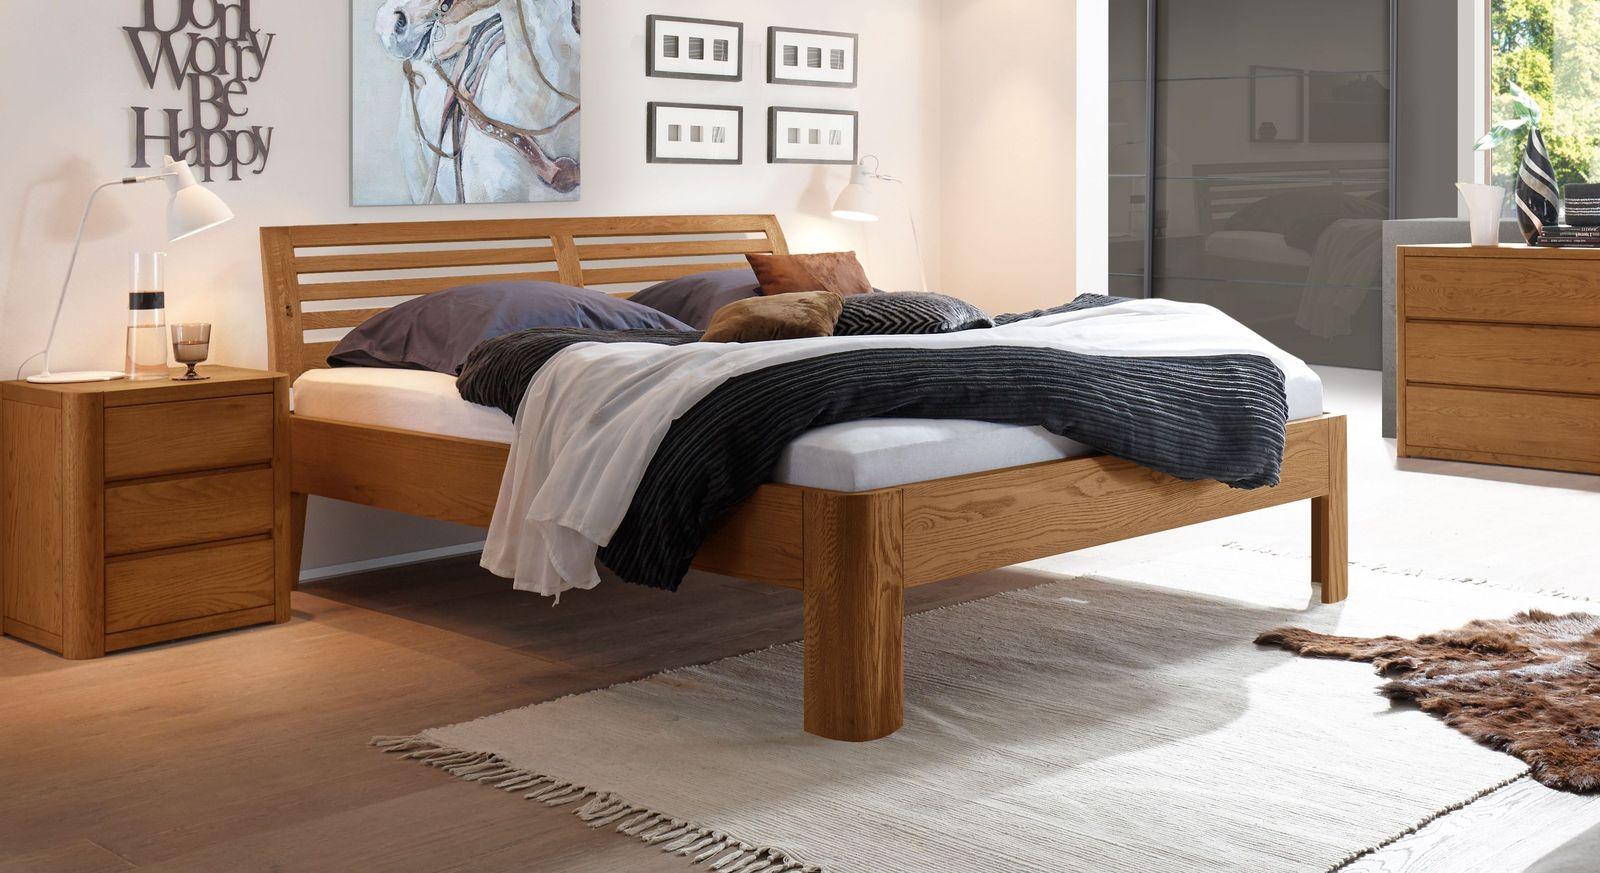 Bett Barcelona aus cognacfarbenem Eichenholz